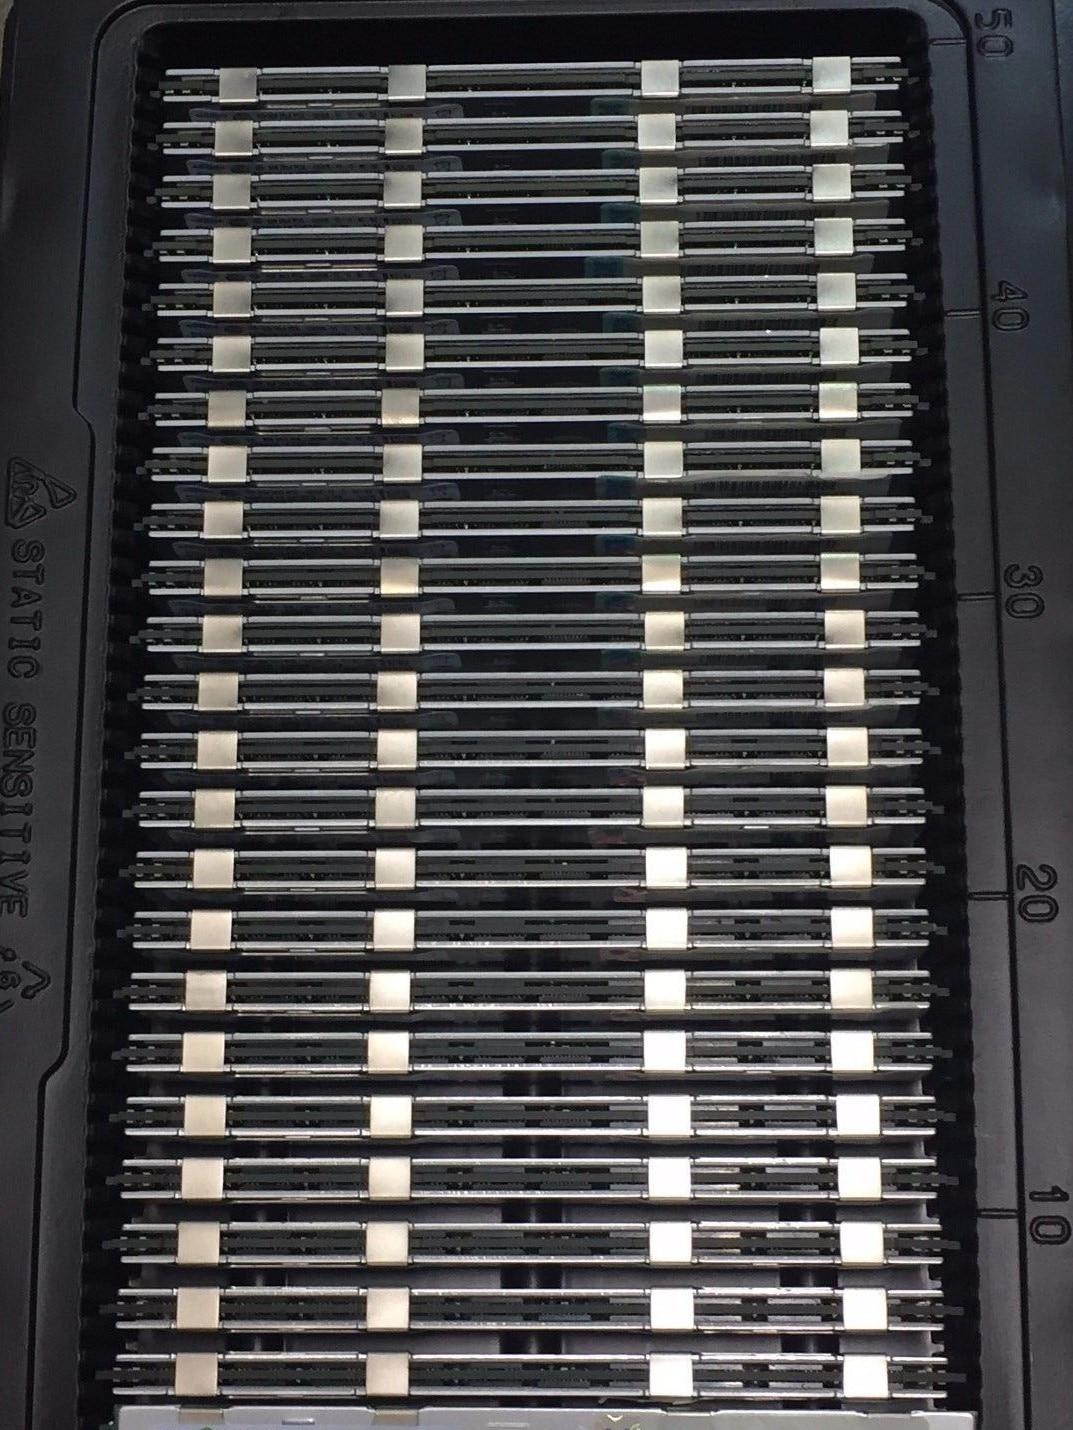 ل 32GB DDR4 REG 2R * 4 PC4-2400T M393A4K40CB1-CRC 1 سنة الضمان